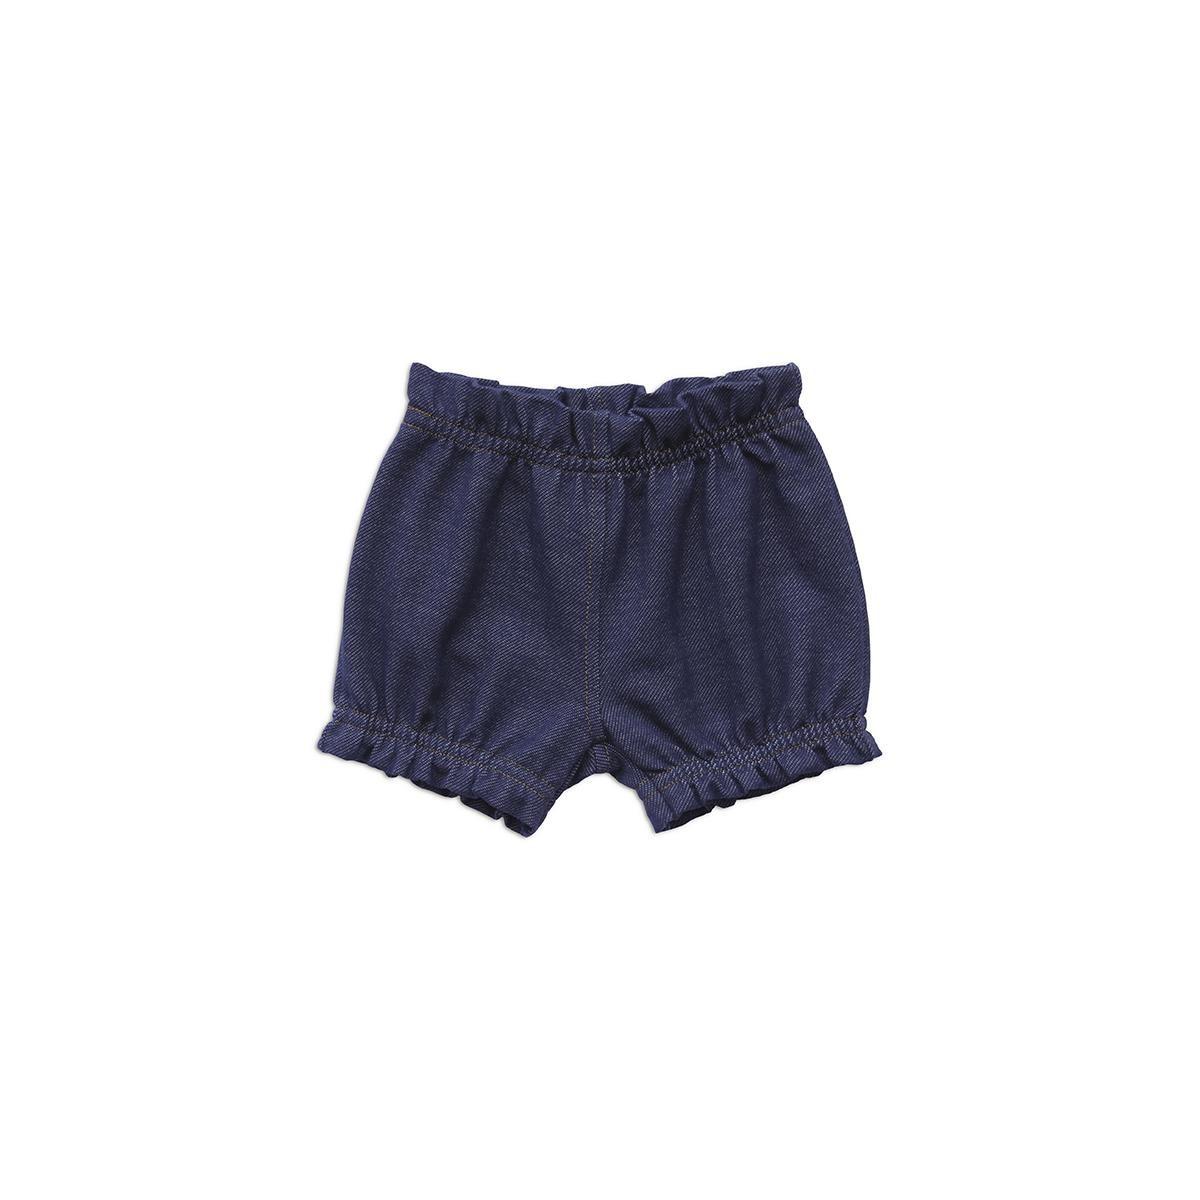 Shorts Feminino Estilo Jeans Moletinho 65% Algodão 31% Poliéster 4% Elastano